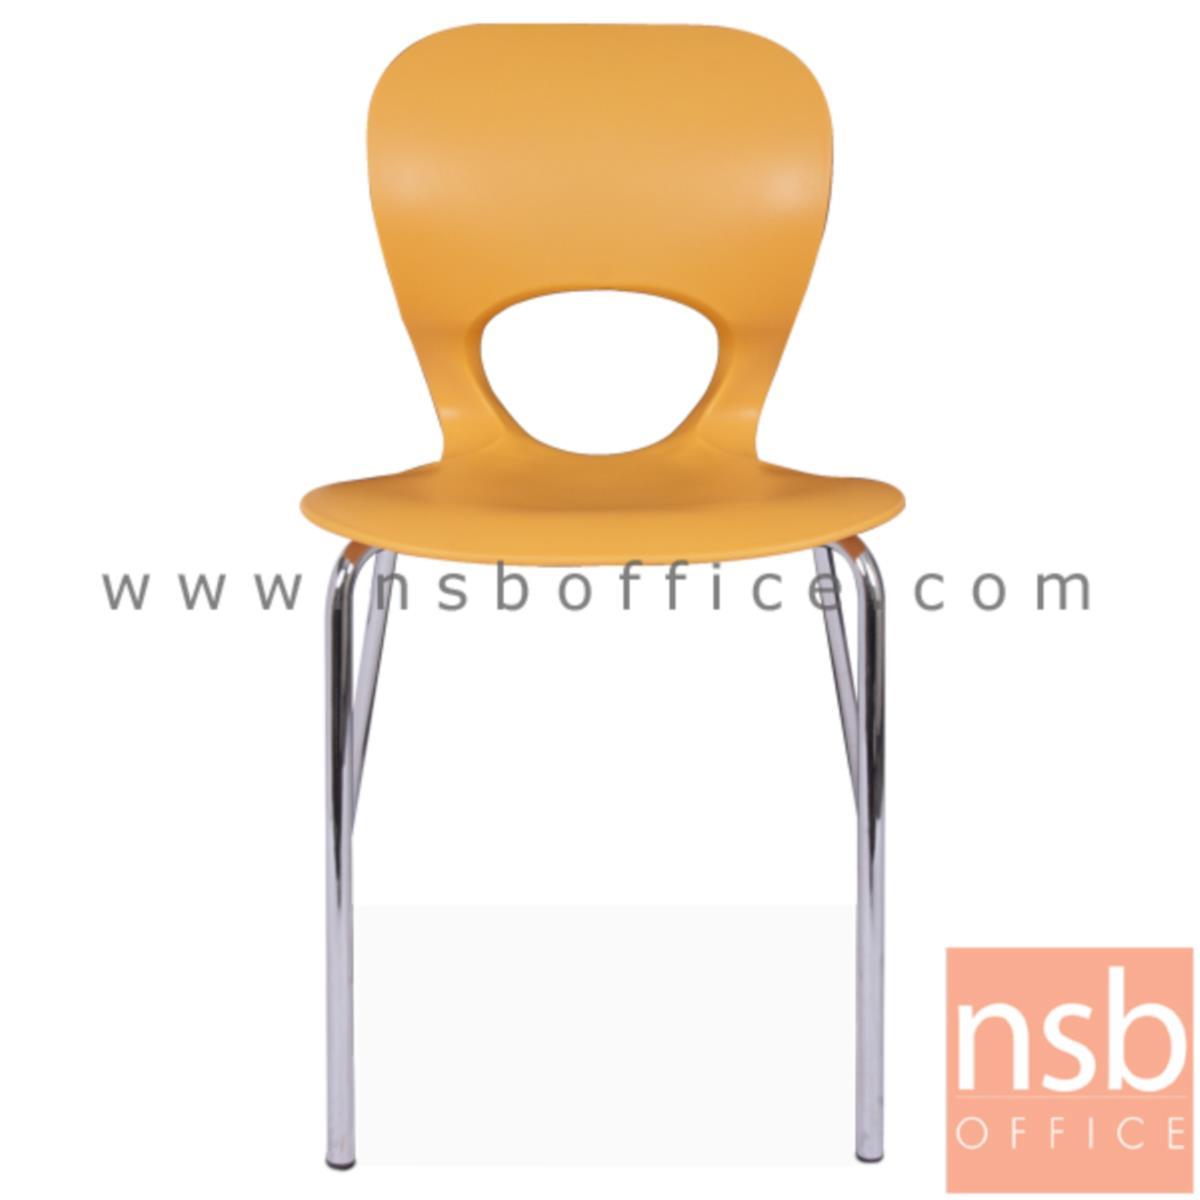 B05A101:เก้าอี้อเนกประสงค์เฟรมโพลี่ รุ่น TTY-LOVE-40  ขาเหล็กชุบโครเมี่ยม